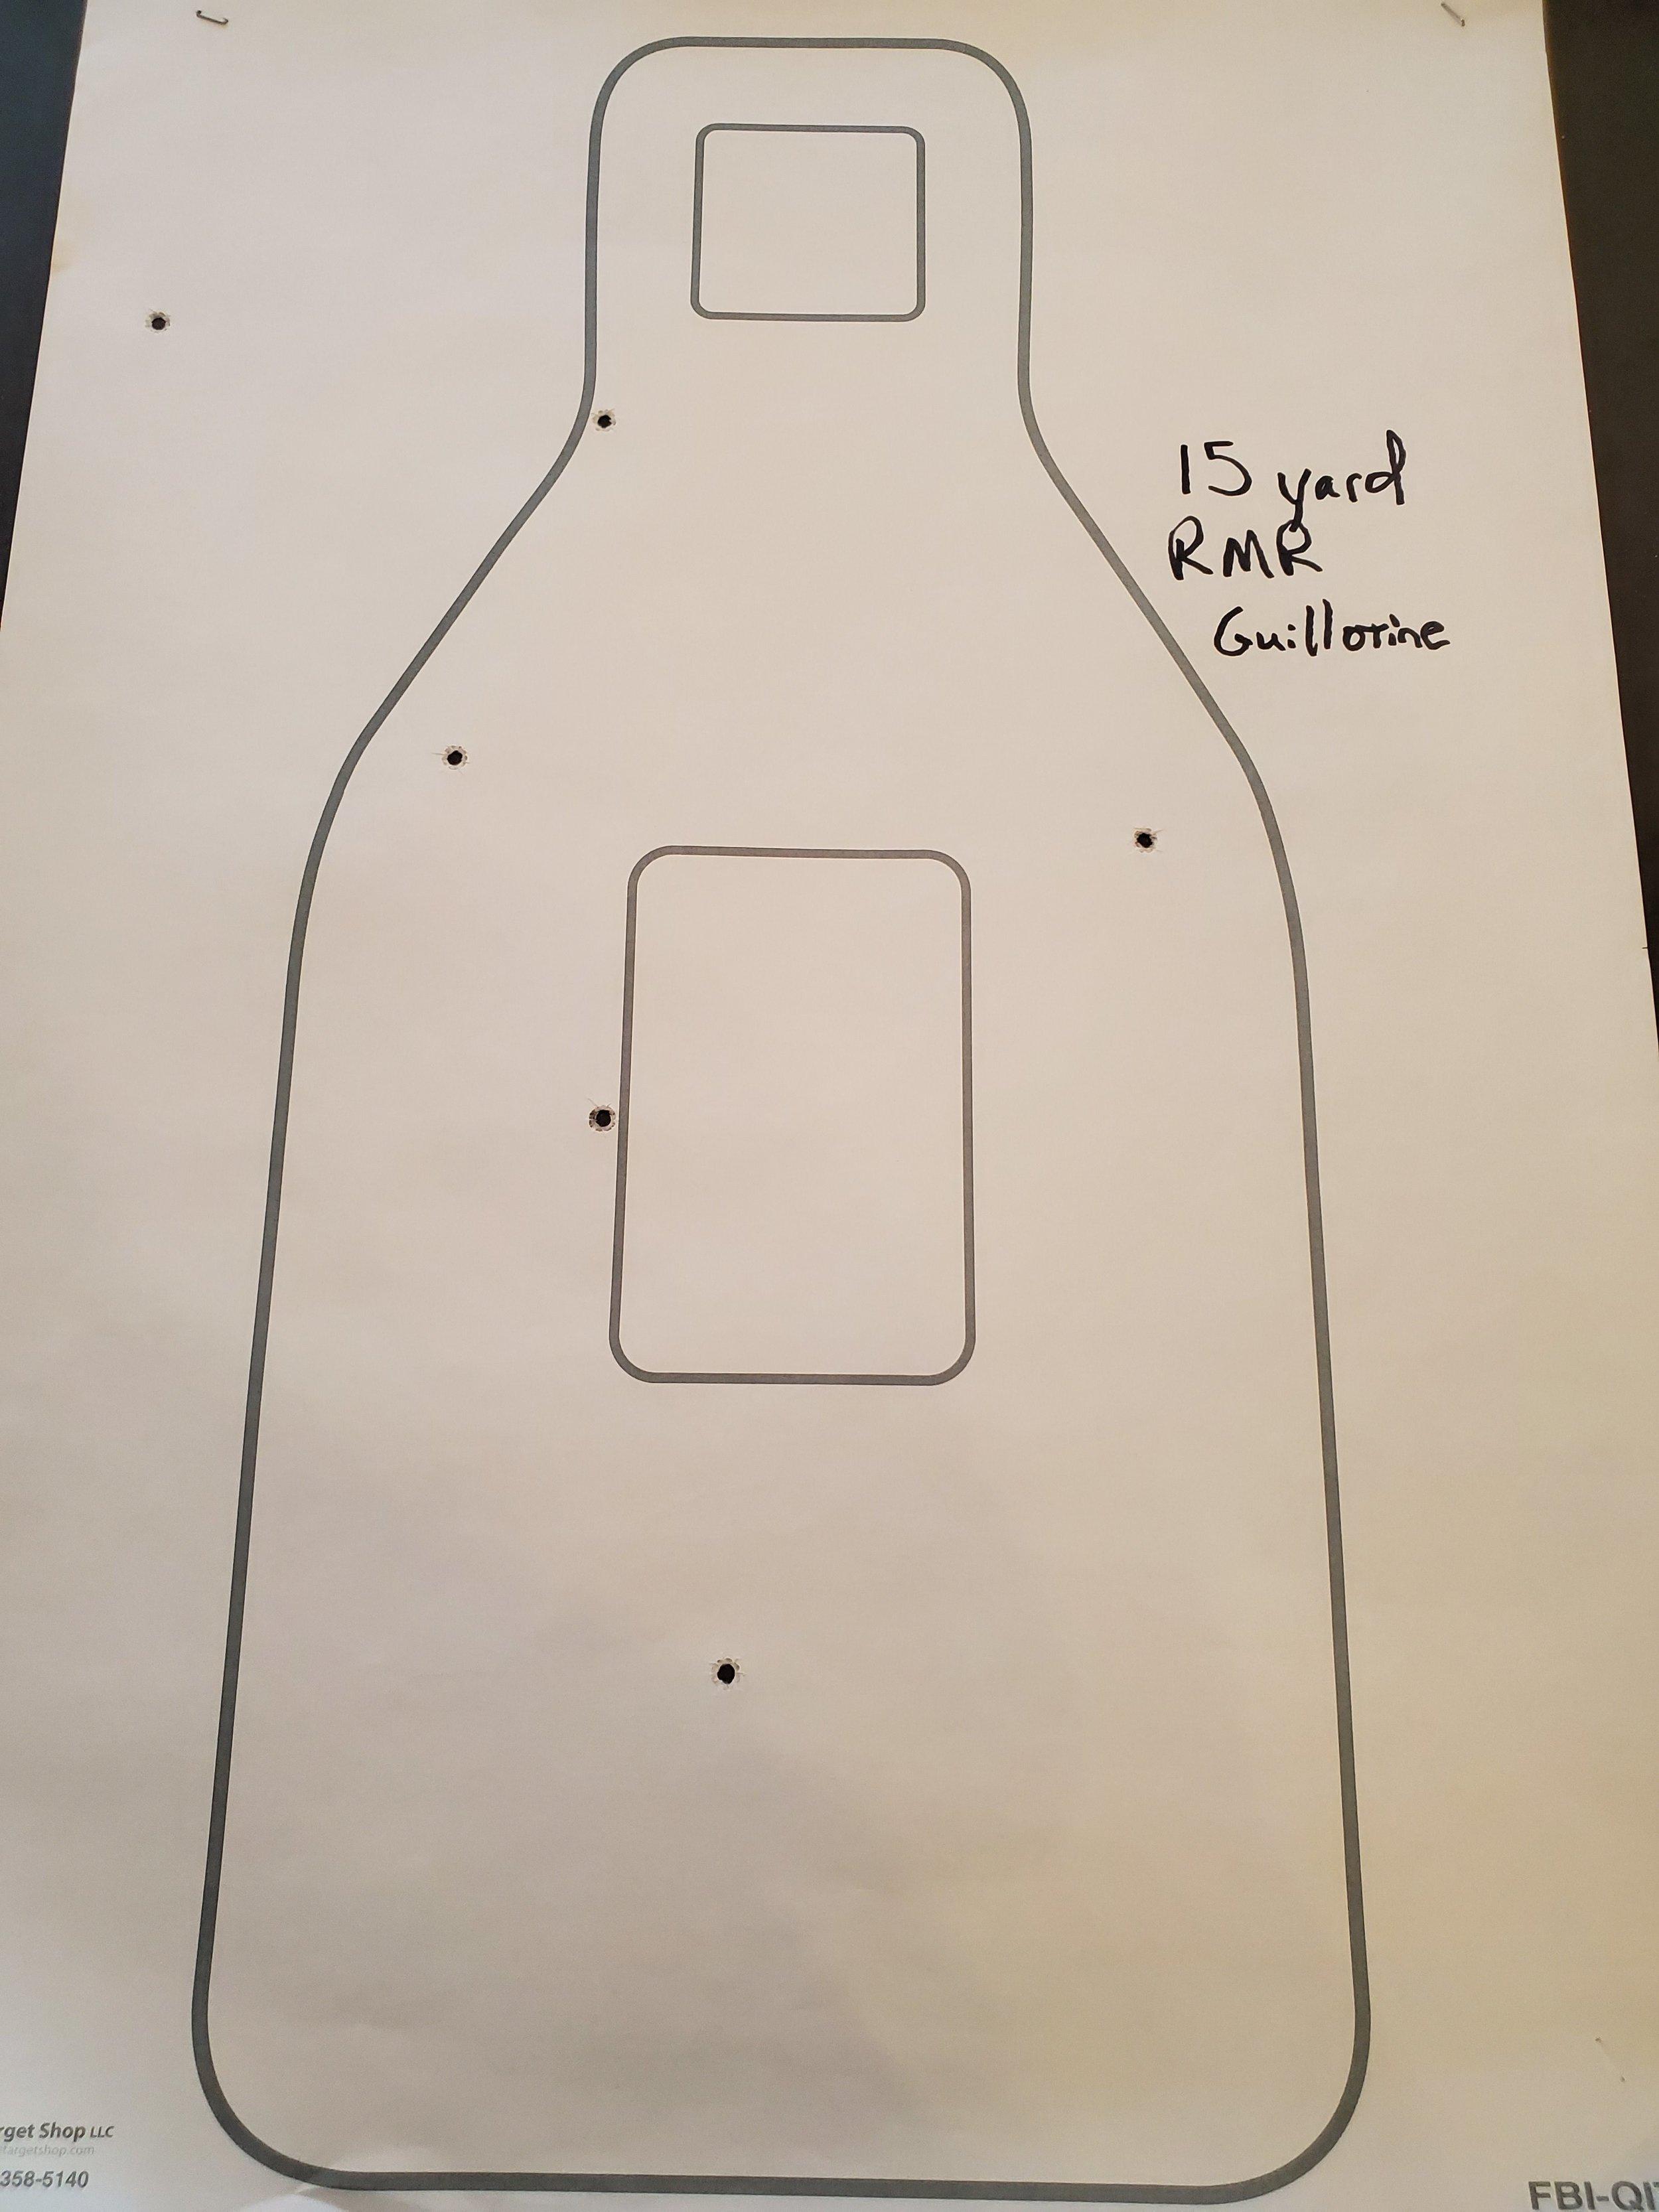 15 yards guillotine.jpg